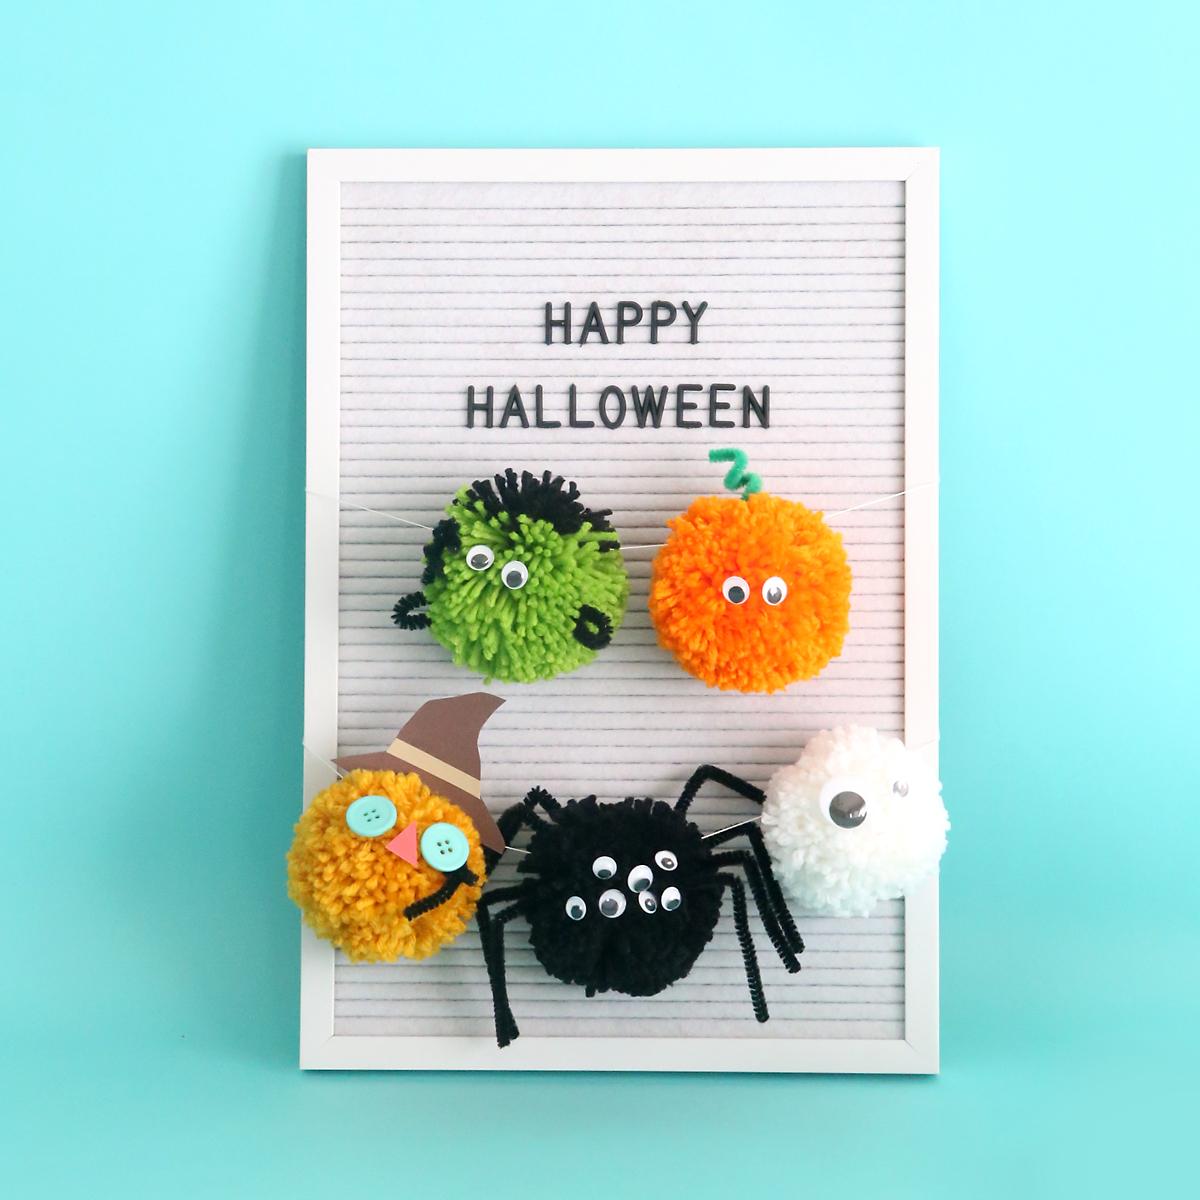 Halloween pom pom pals {easy kids' craft}